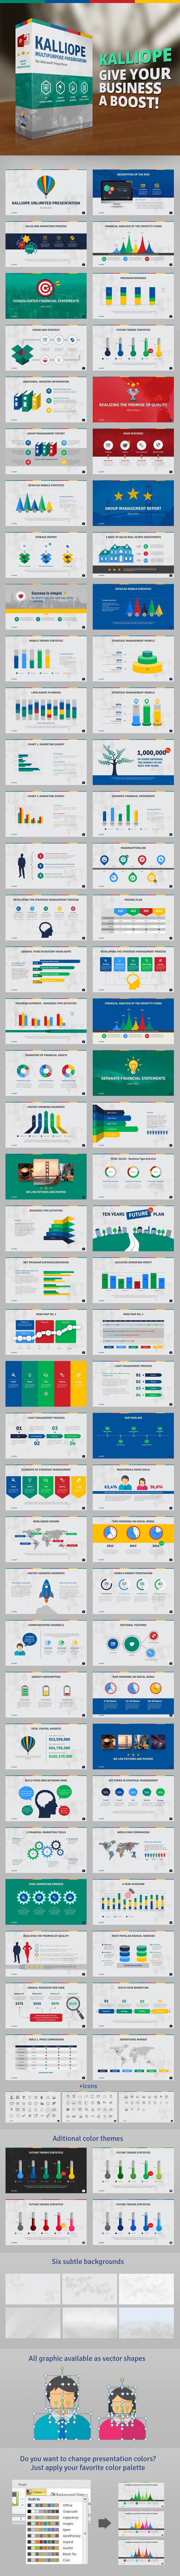 Kalliope PowerPoint Template - PowerPoint Templates Presentation Templates